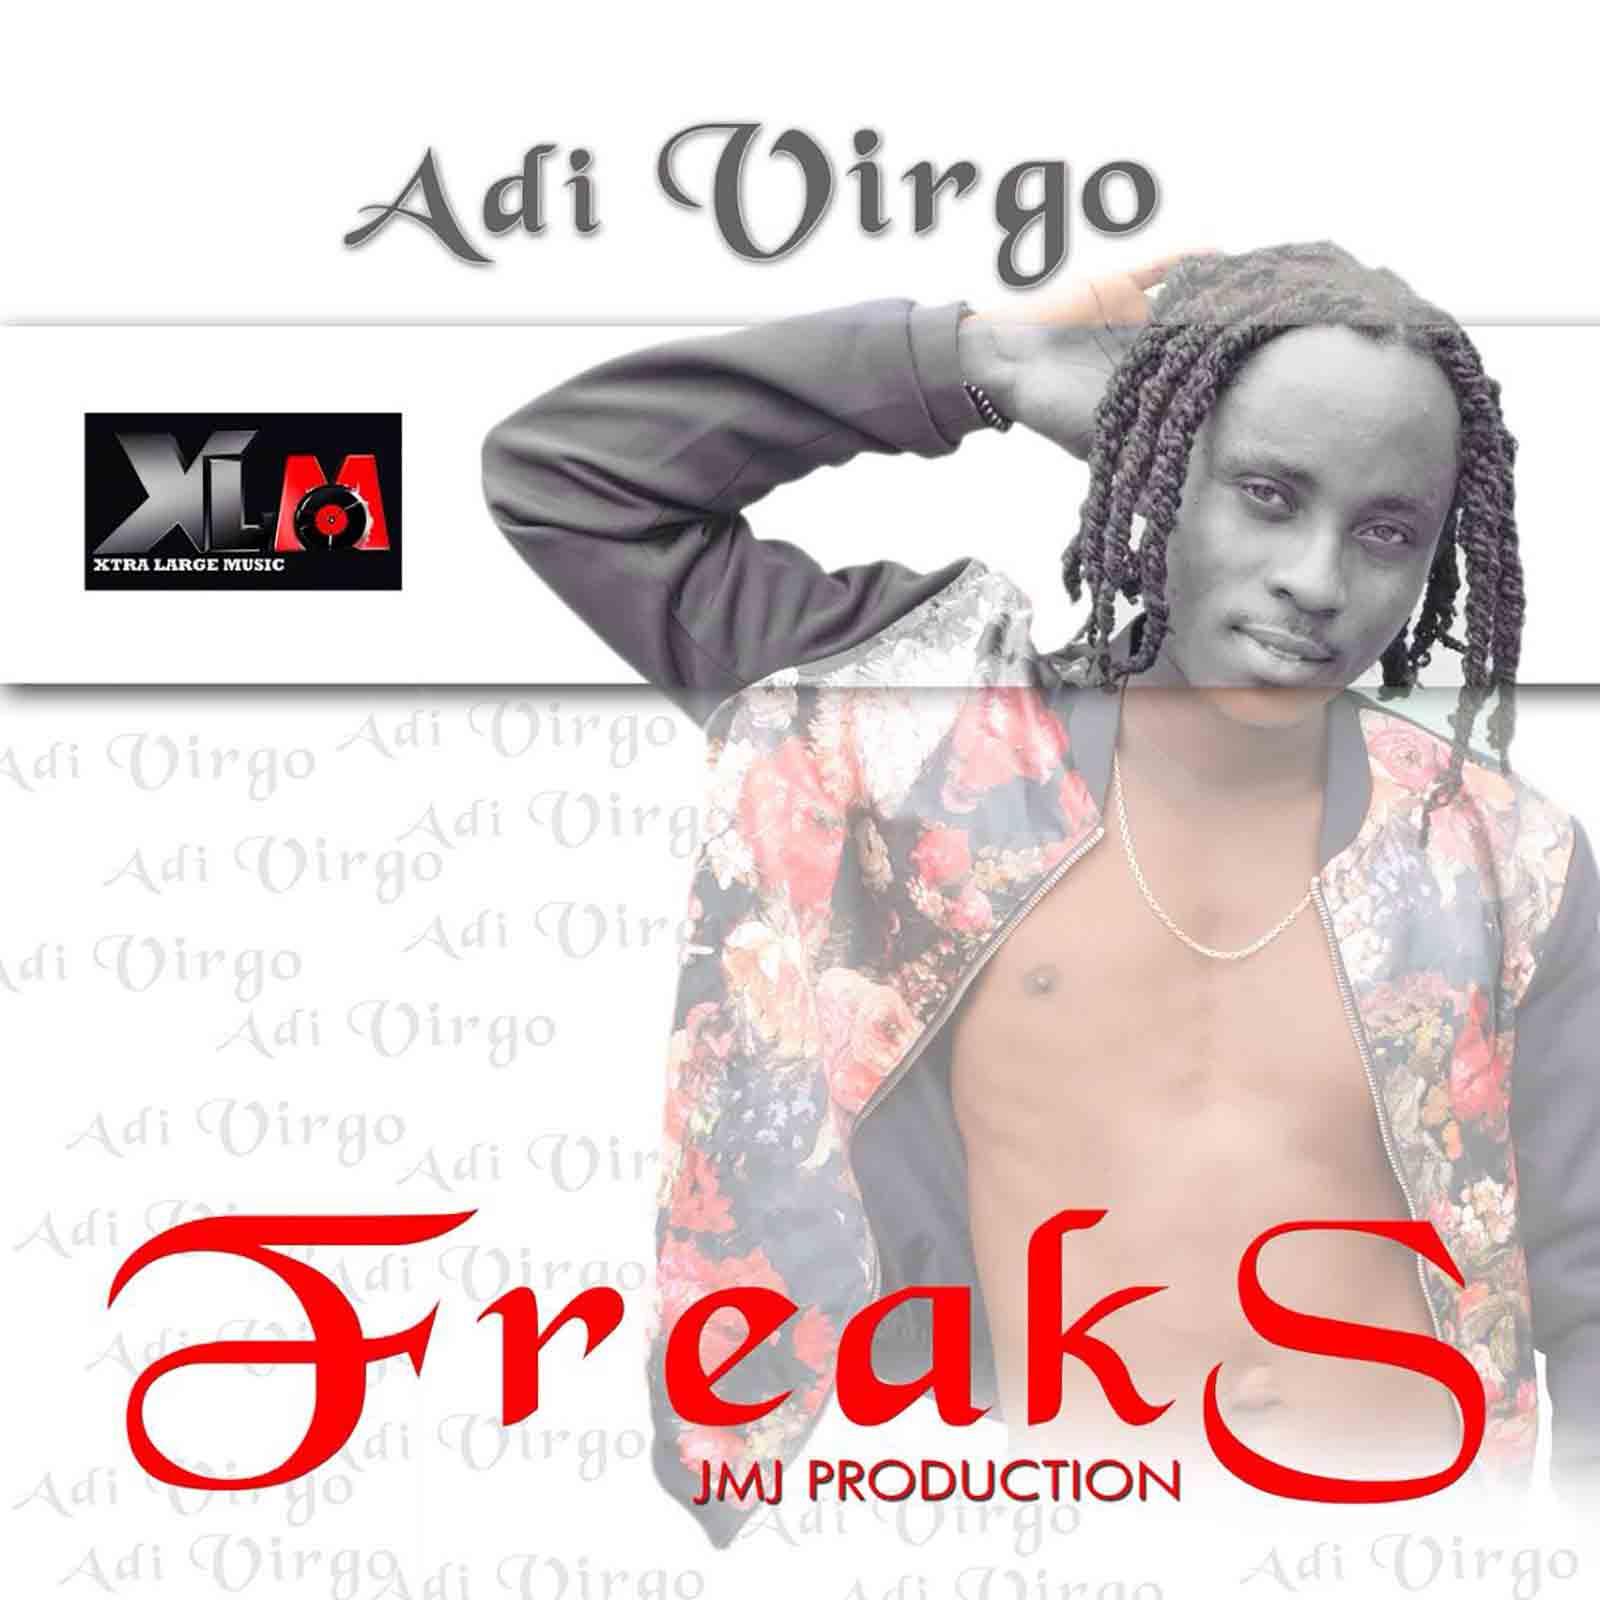 Freaks by Adi Virgo